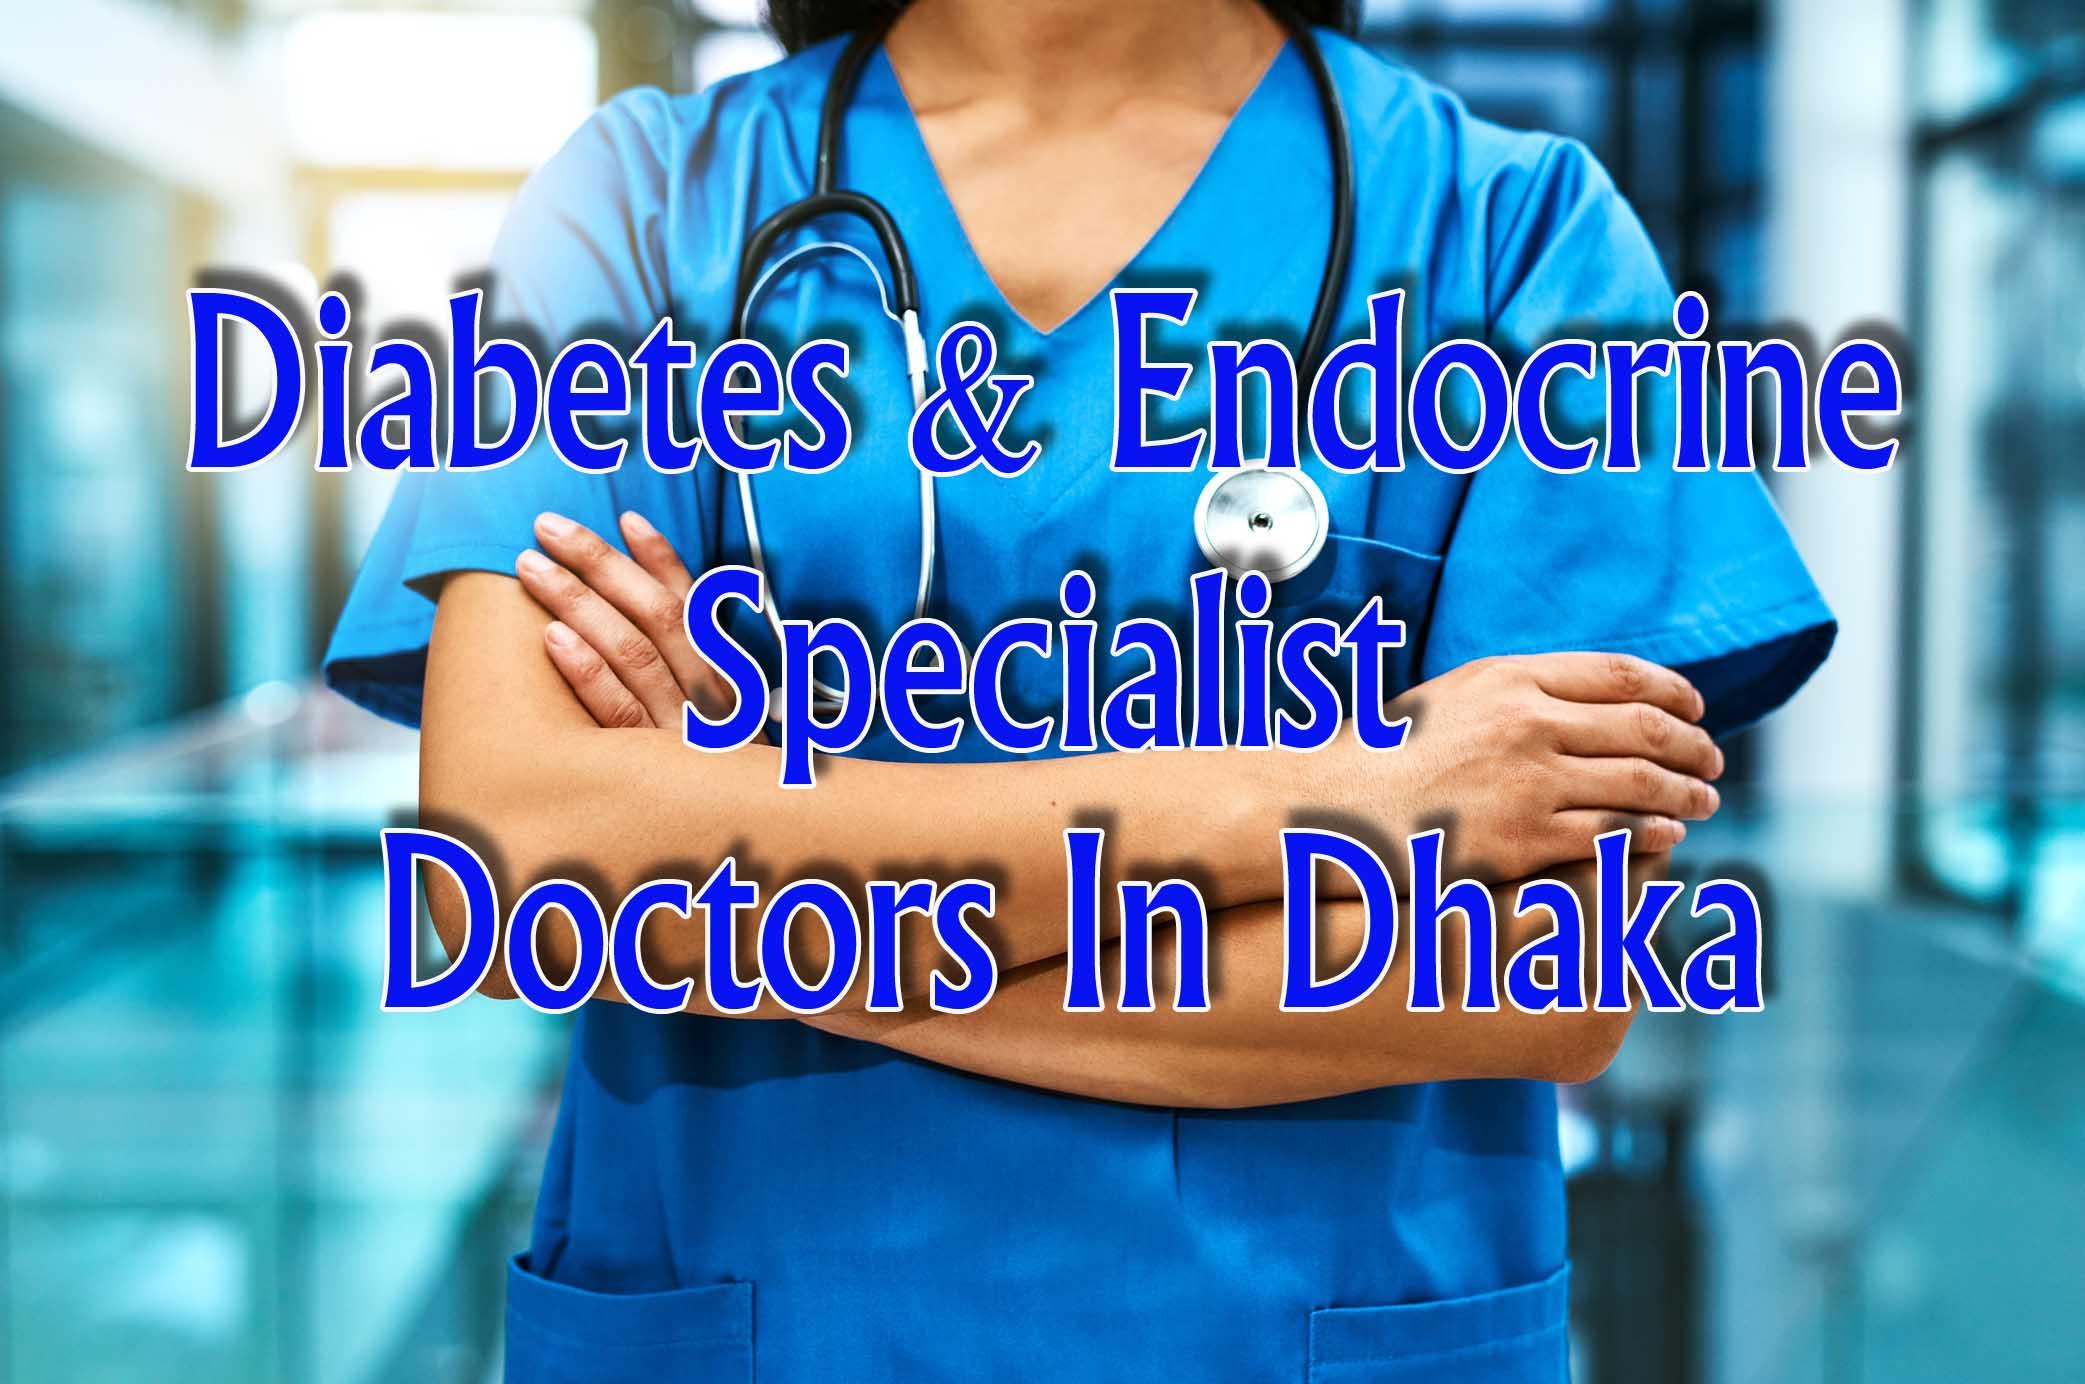 Diabetes & Endocrine